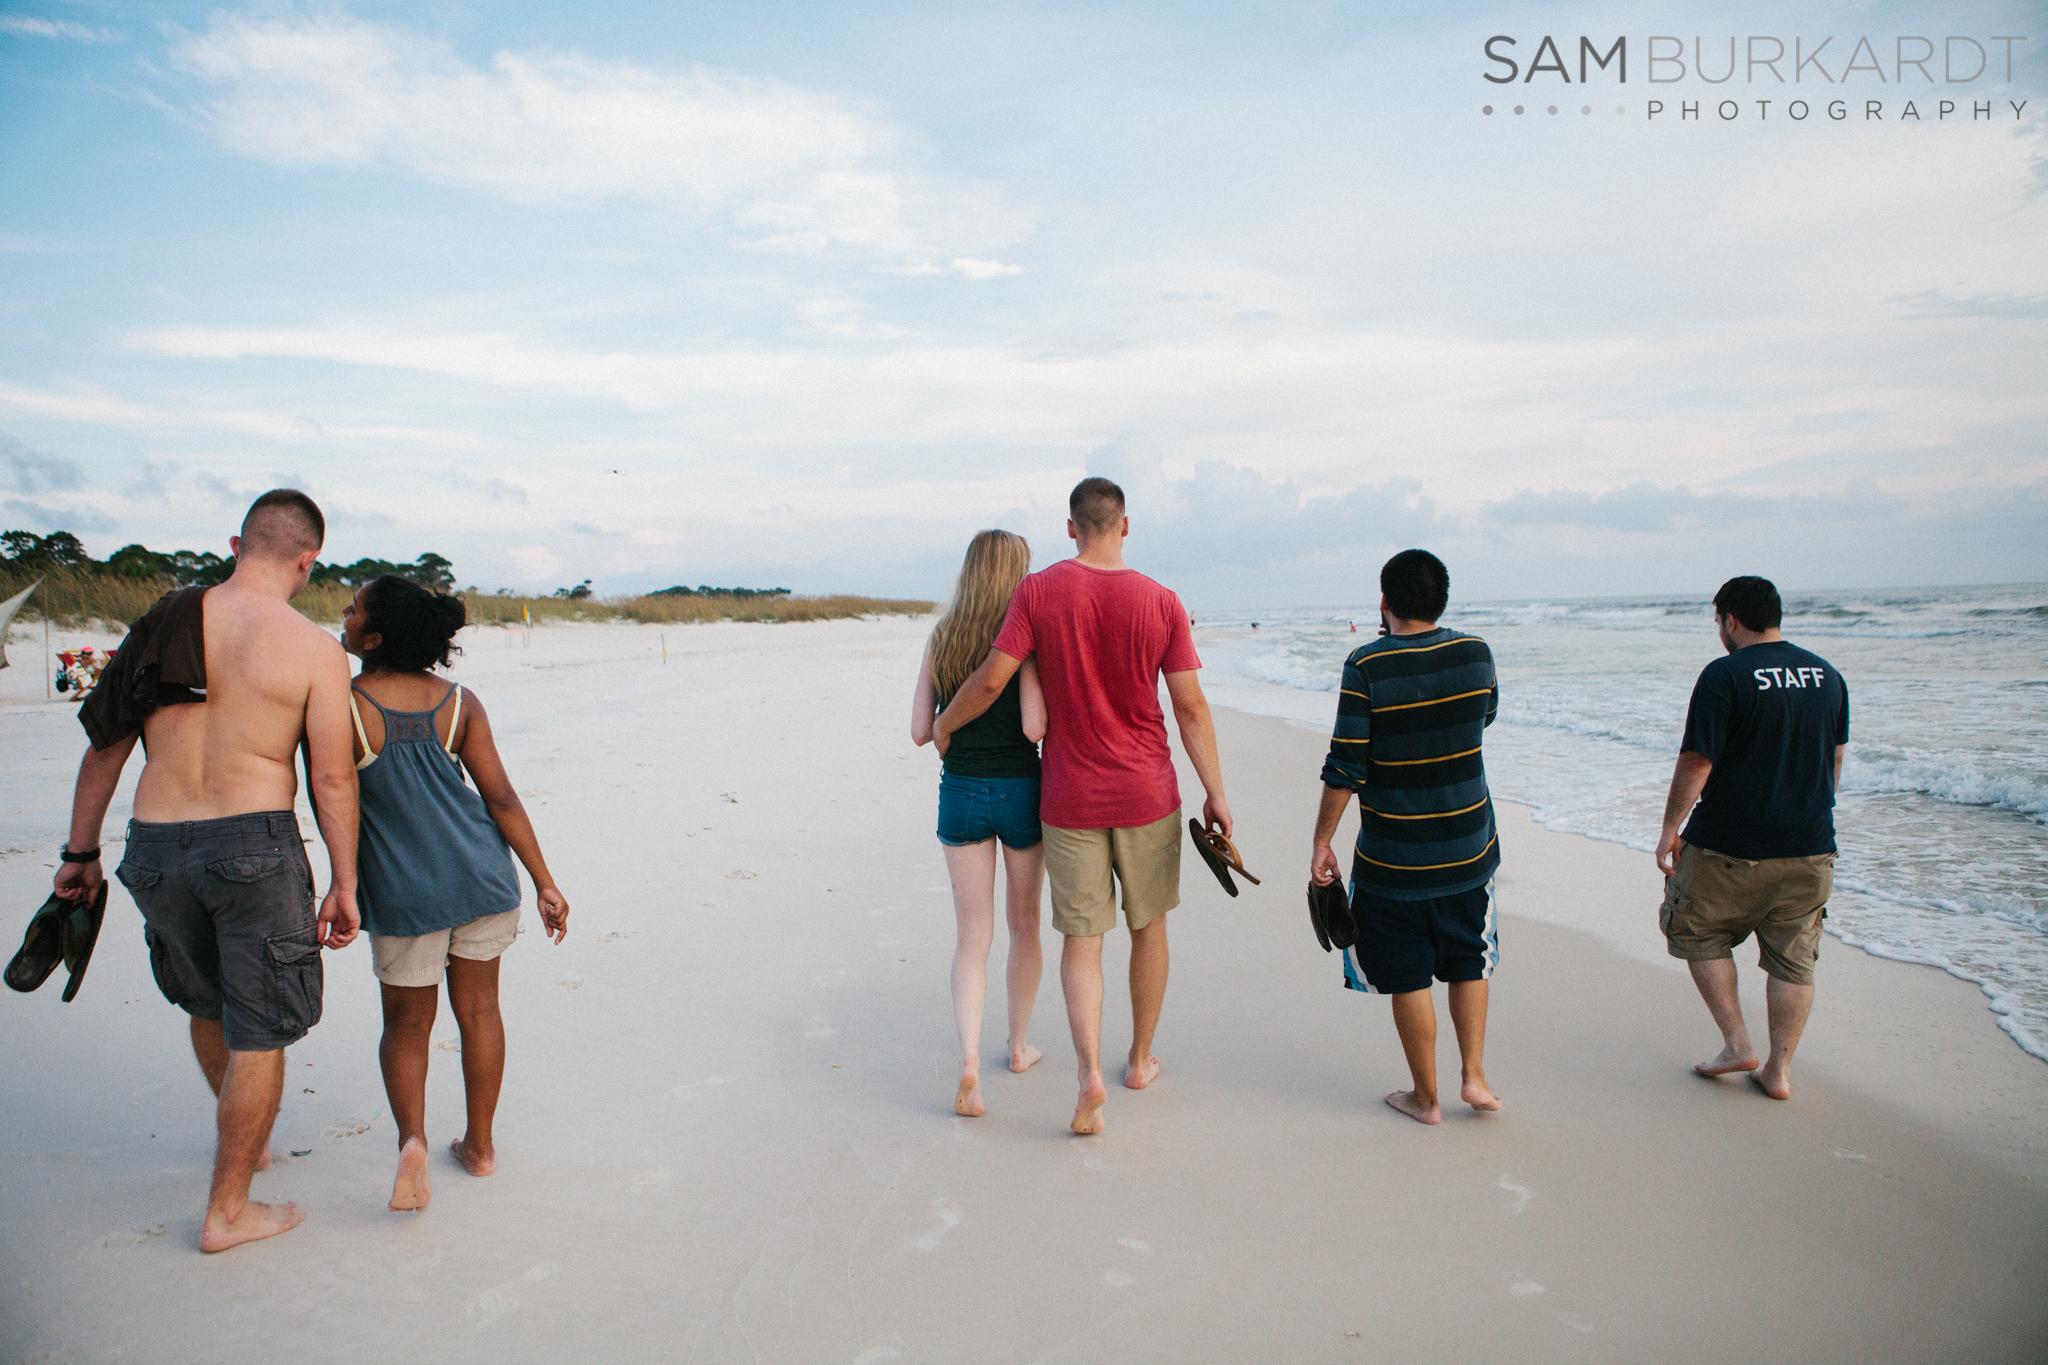 samburkardt_engagement_vacation_beach_cape_san_blas_florida_camping_gopro_0014.jpg